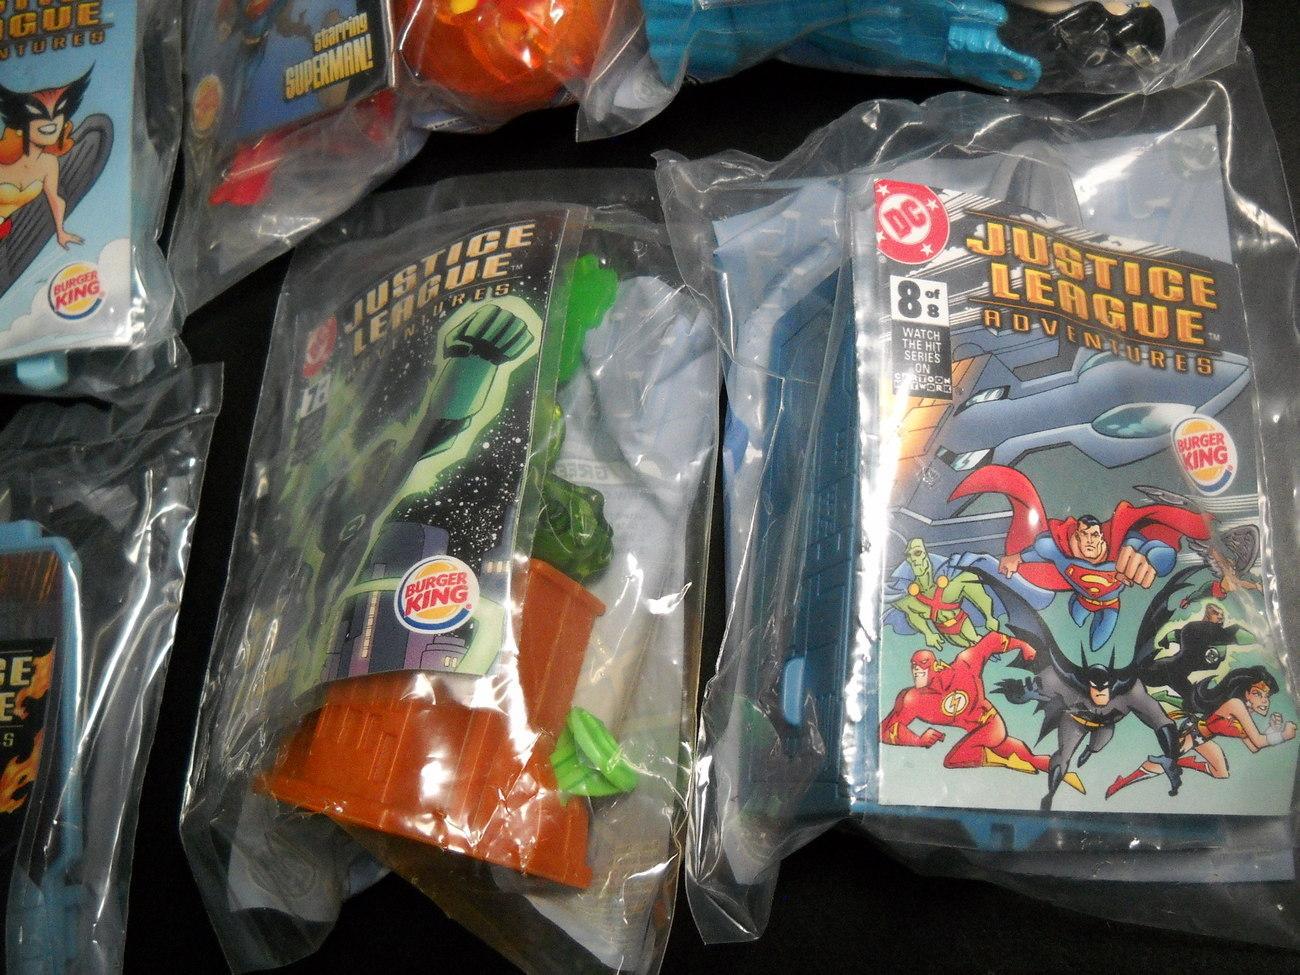 Justice League Adventures Burger King Premium Collectibles 2003 Cartoon Network